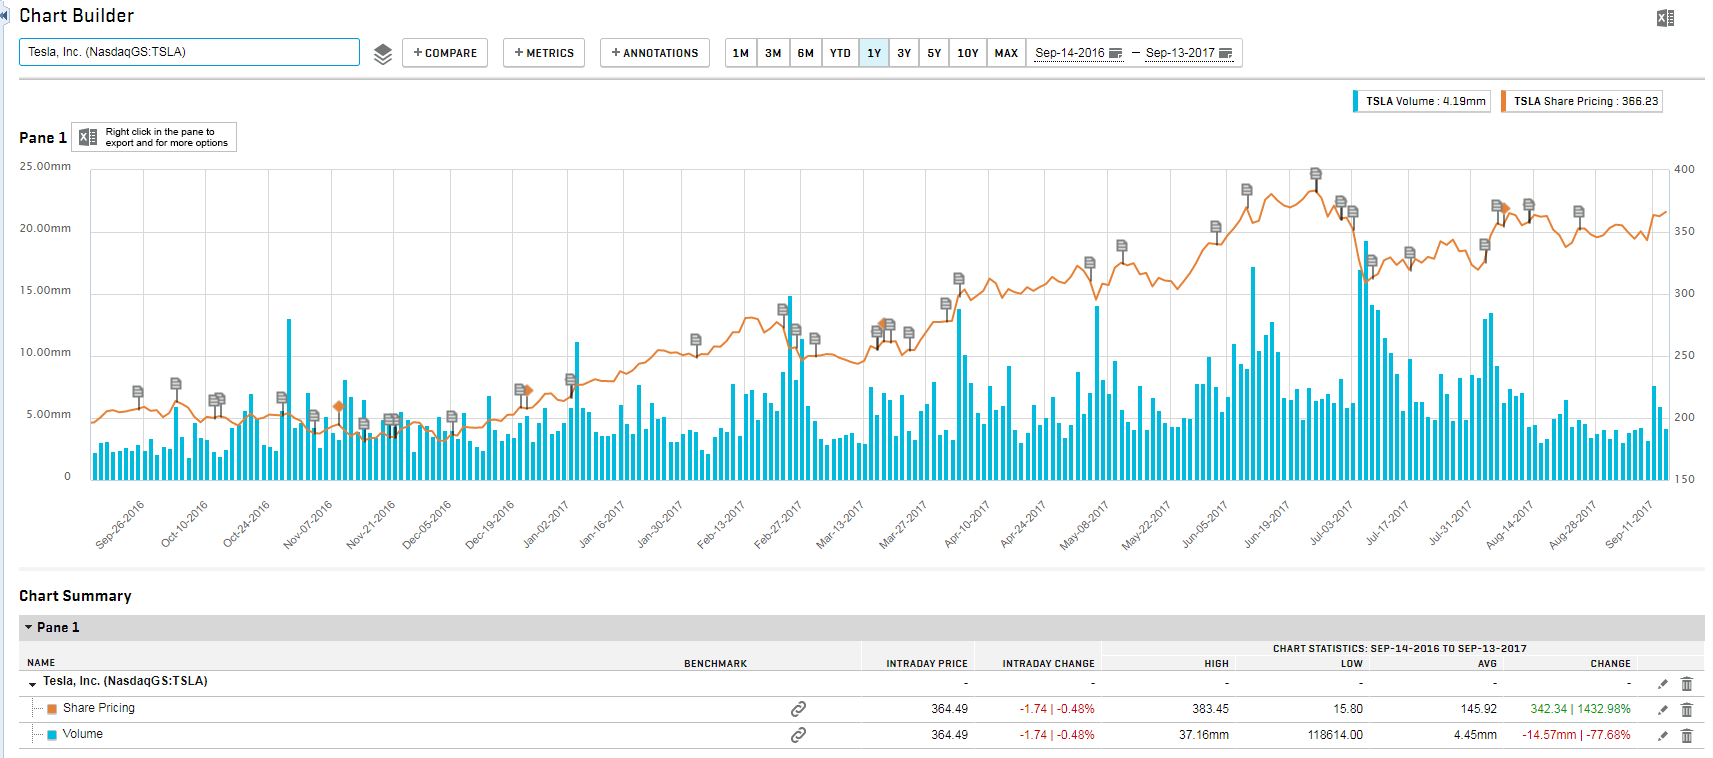 Sp capital iq netadvantage new name content and interface tesla stock price chart baditri Images